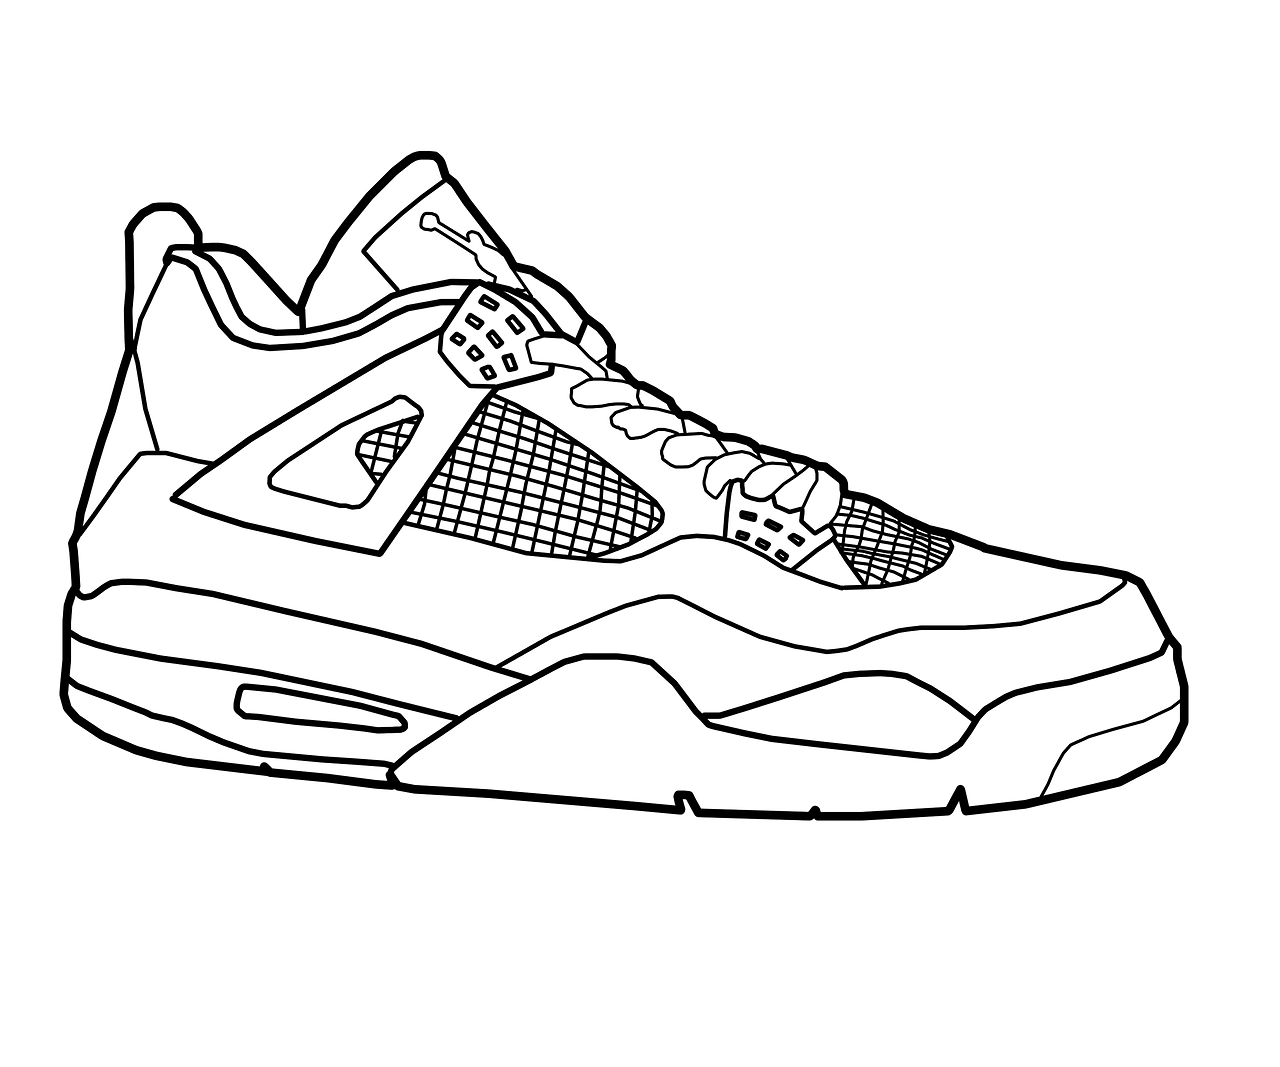 15 Pics Of Drawing Jordans Shoes Coloring Pages - Jordan Retro 5 ...